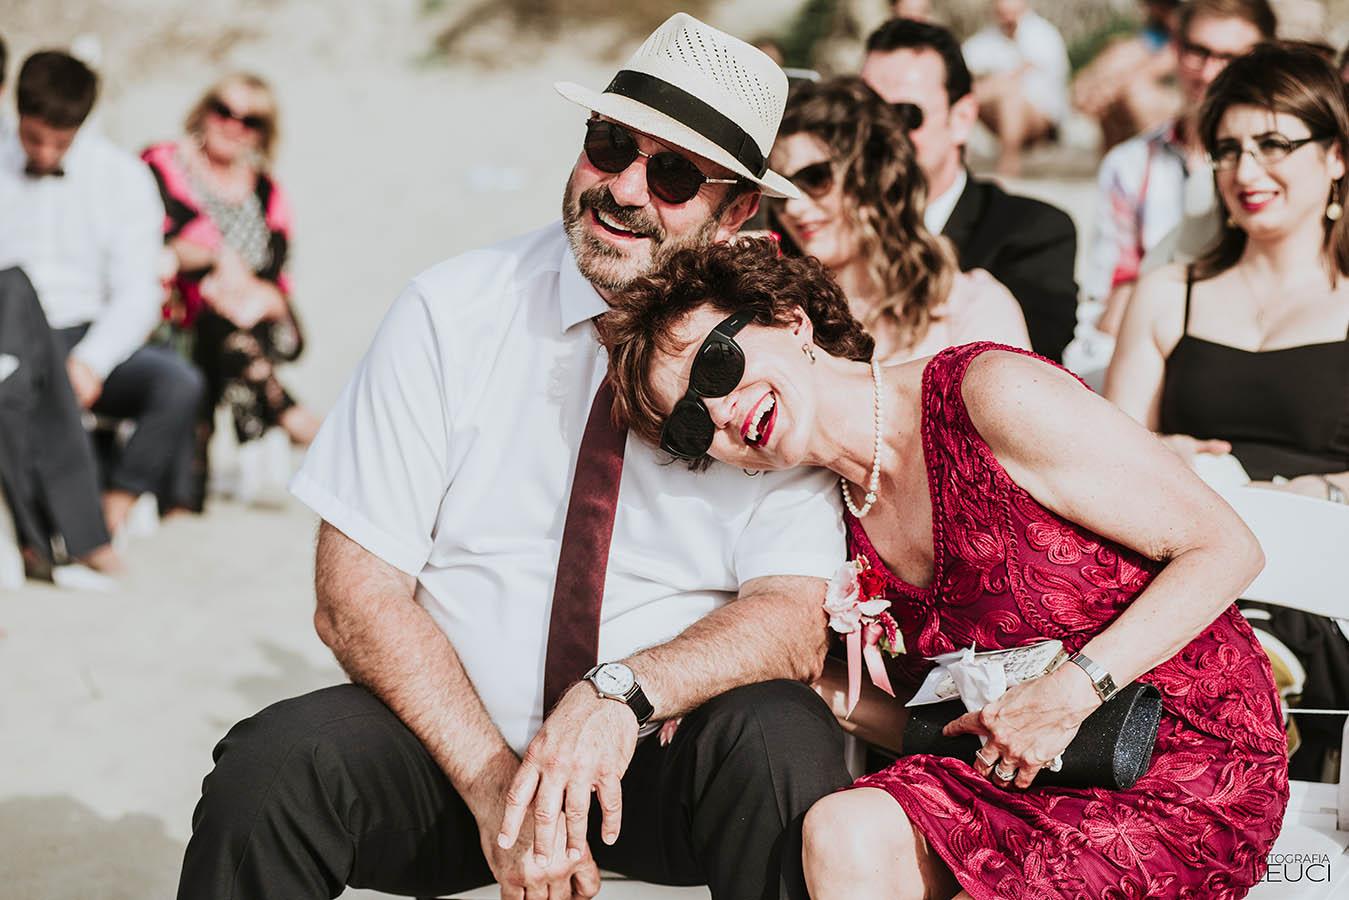 Idee Matrimonio Bohemien : Ingredienti per un perfetto matrimonio bohémien in puglia